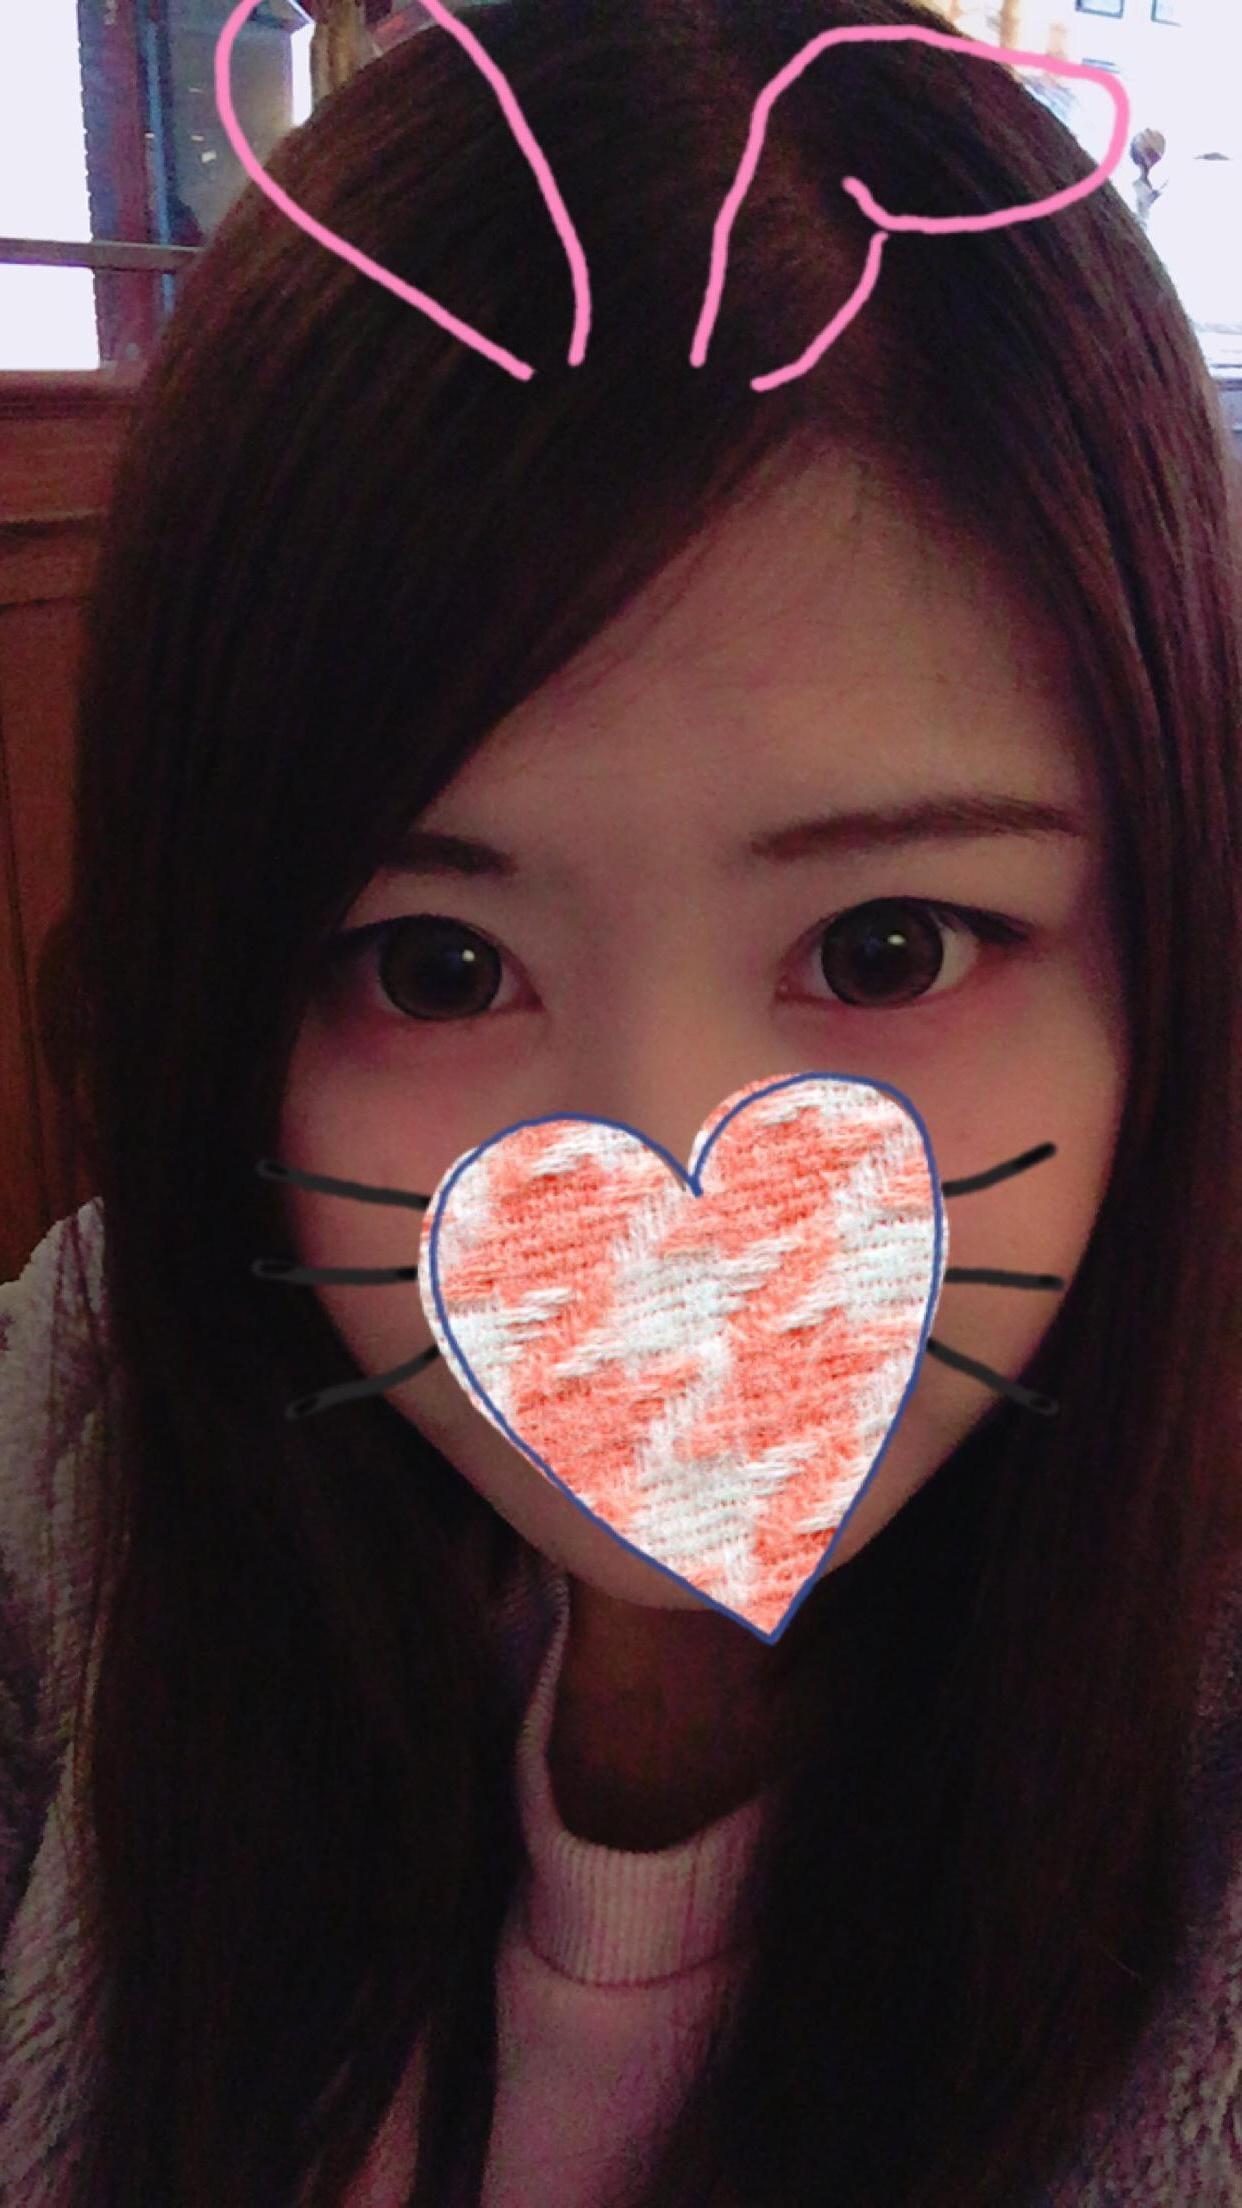 「January 17th ☆」01/17(01/17) 17:59 | まどかの写メ・風俗動画